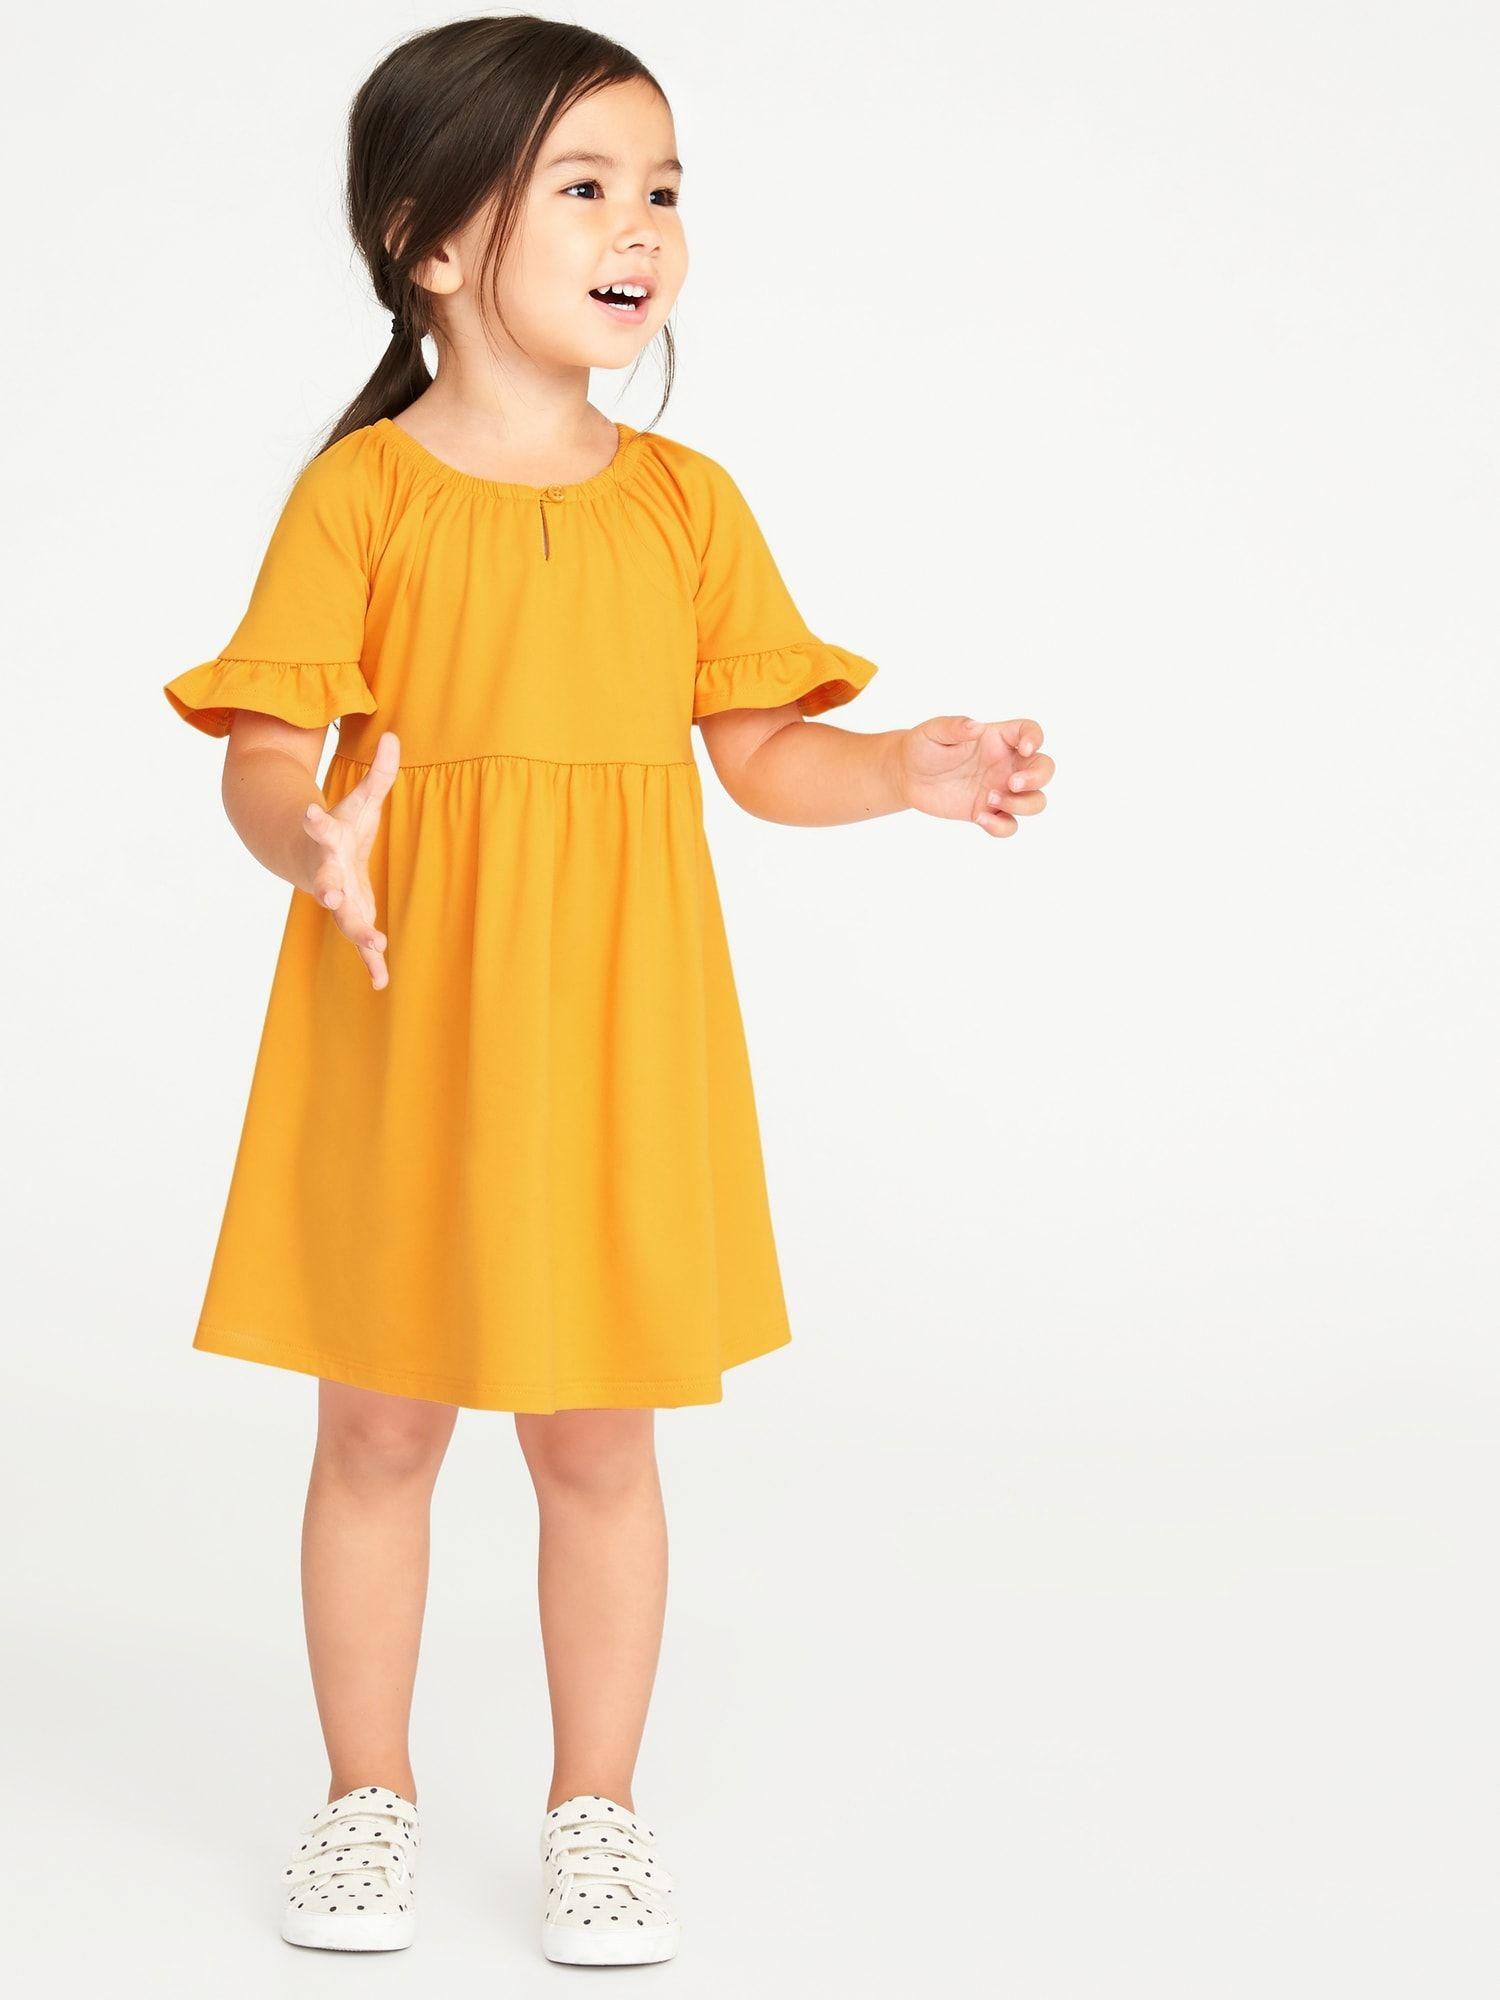 old navy yellow toddler dress buy